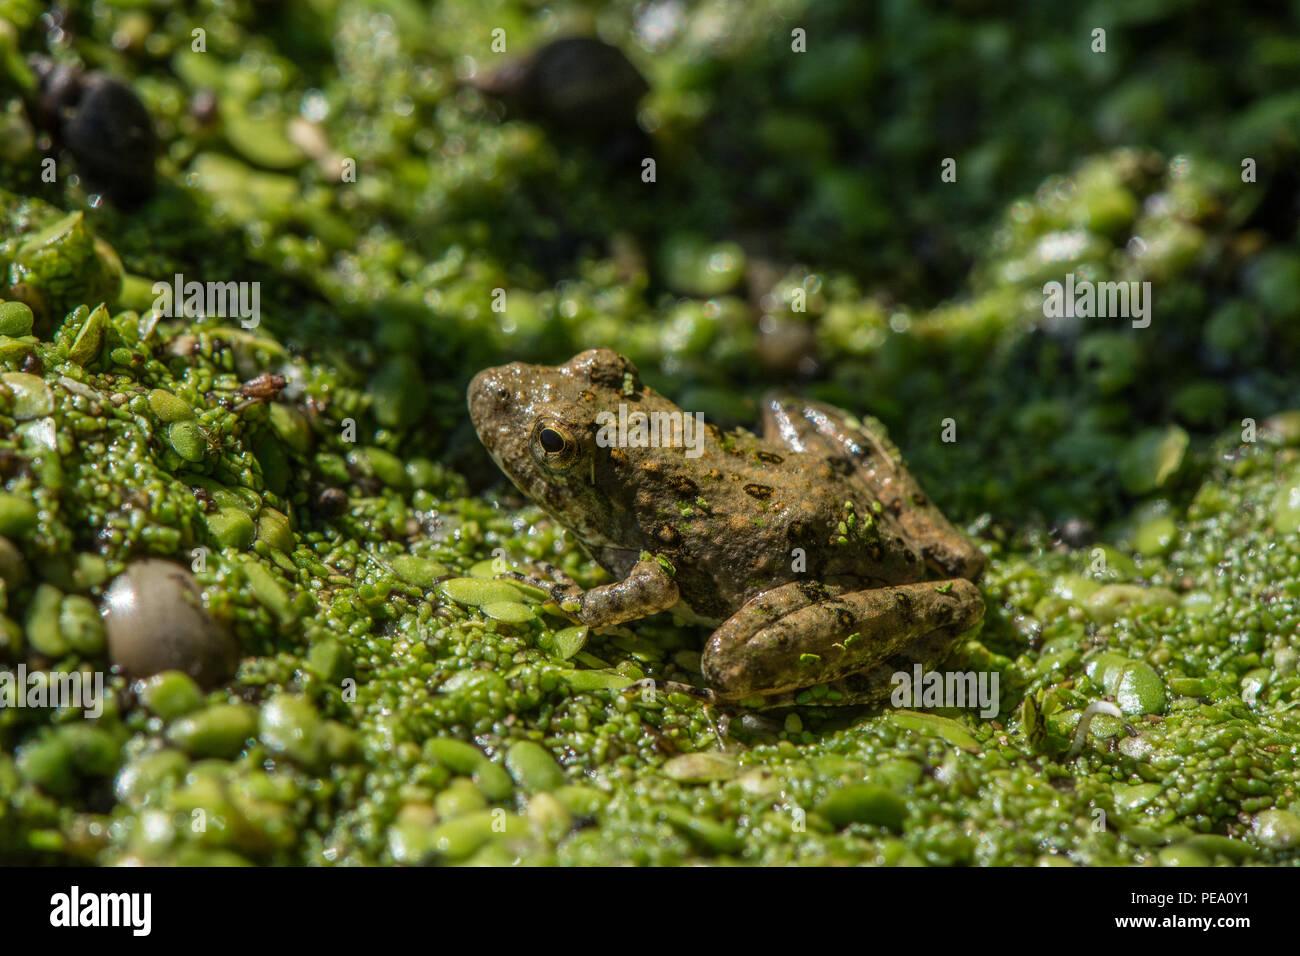 Blanchard's Cricket sapo (Acris blanchardi) de Knox County, Illinois, EE.UU.. Foto de stock